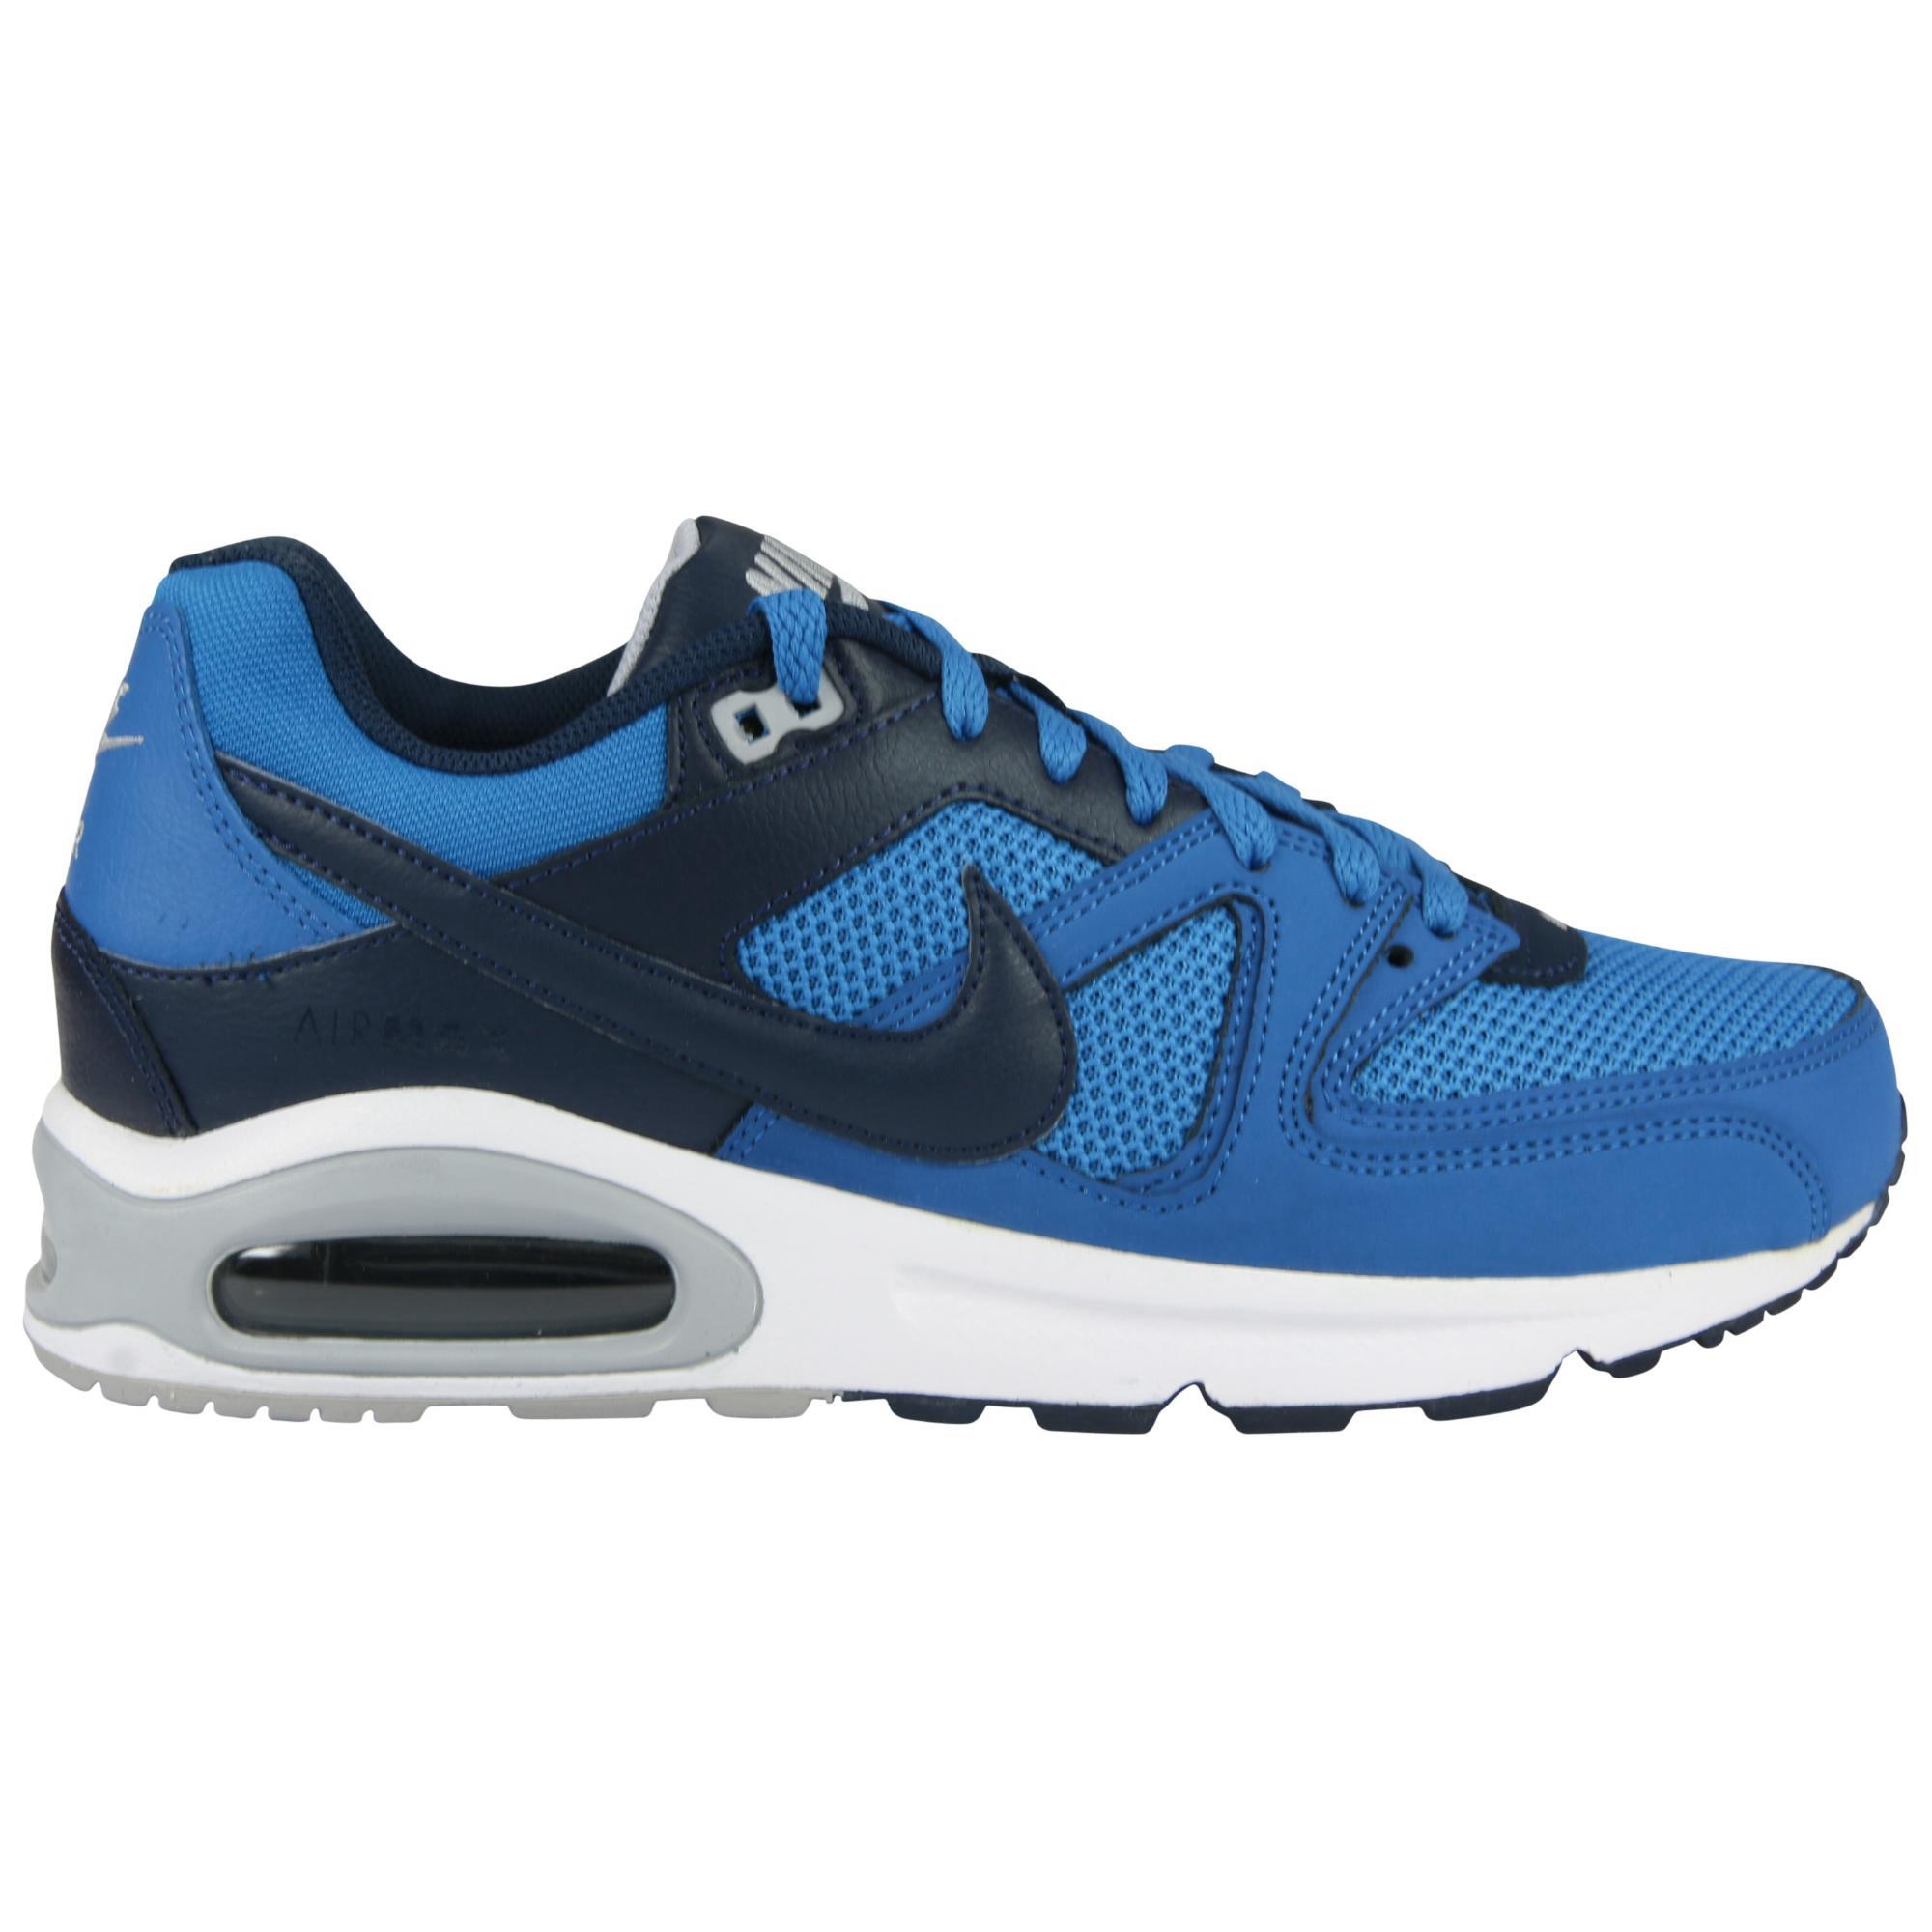 Schuhe Air Sneaker Nike Command Turnschuhe Ebay Max Herren ZqnICwqFx